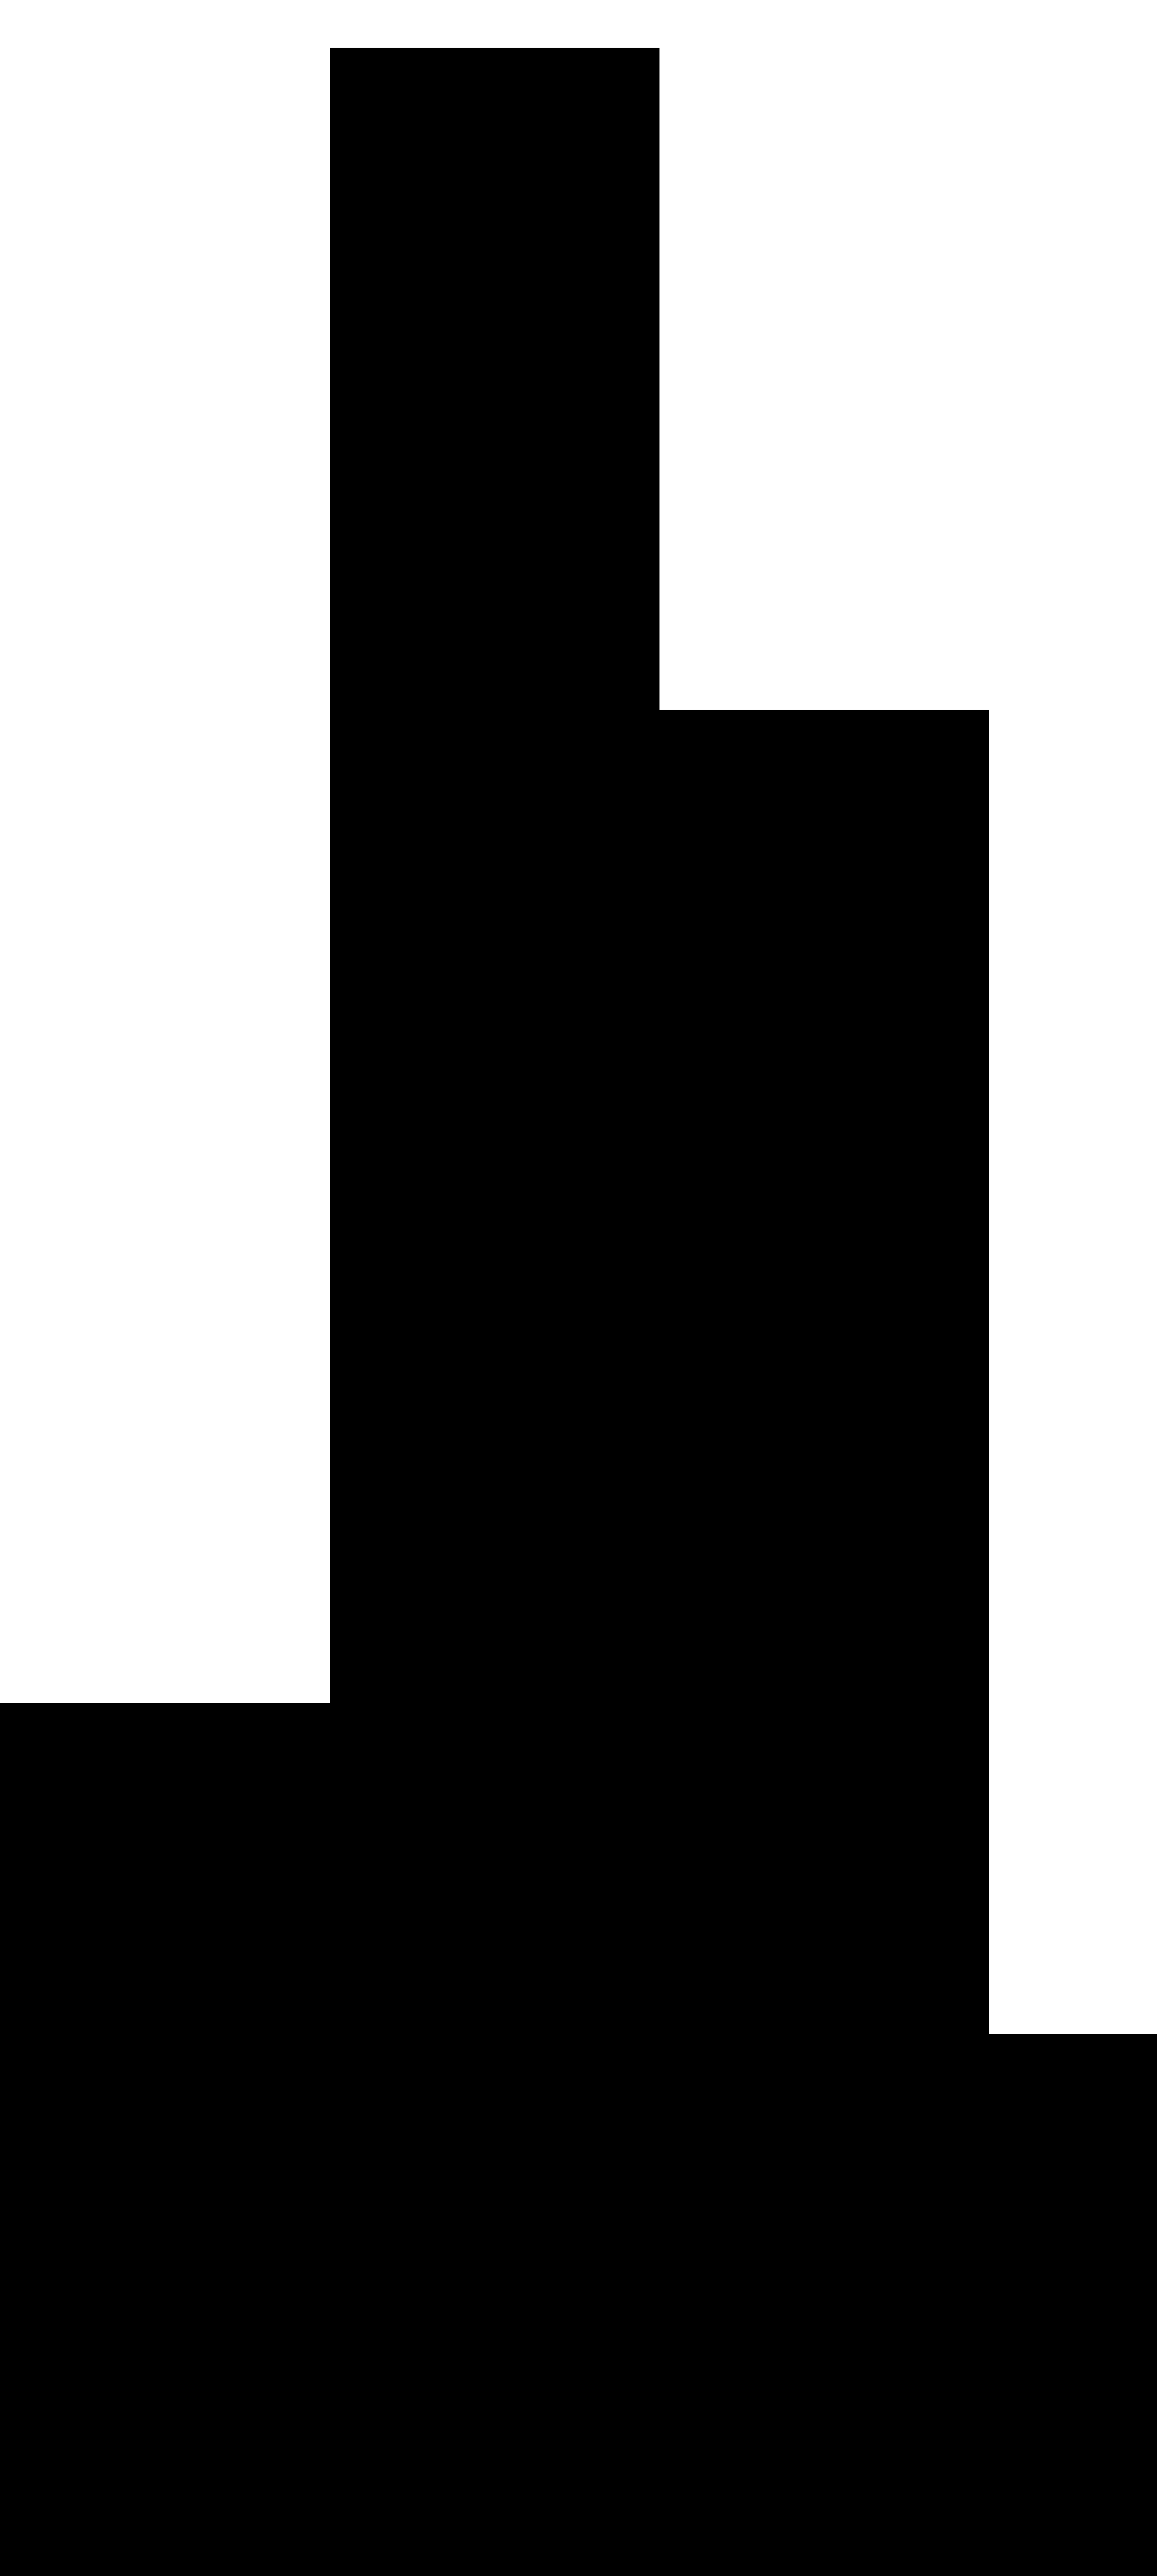 Eiffel Tower Silhouette Transparent PNG Clip Art Image.